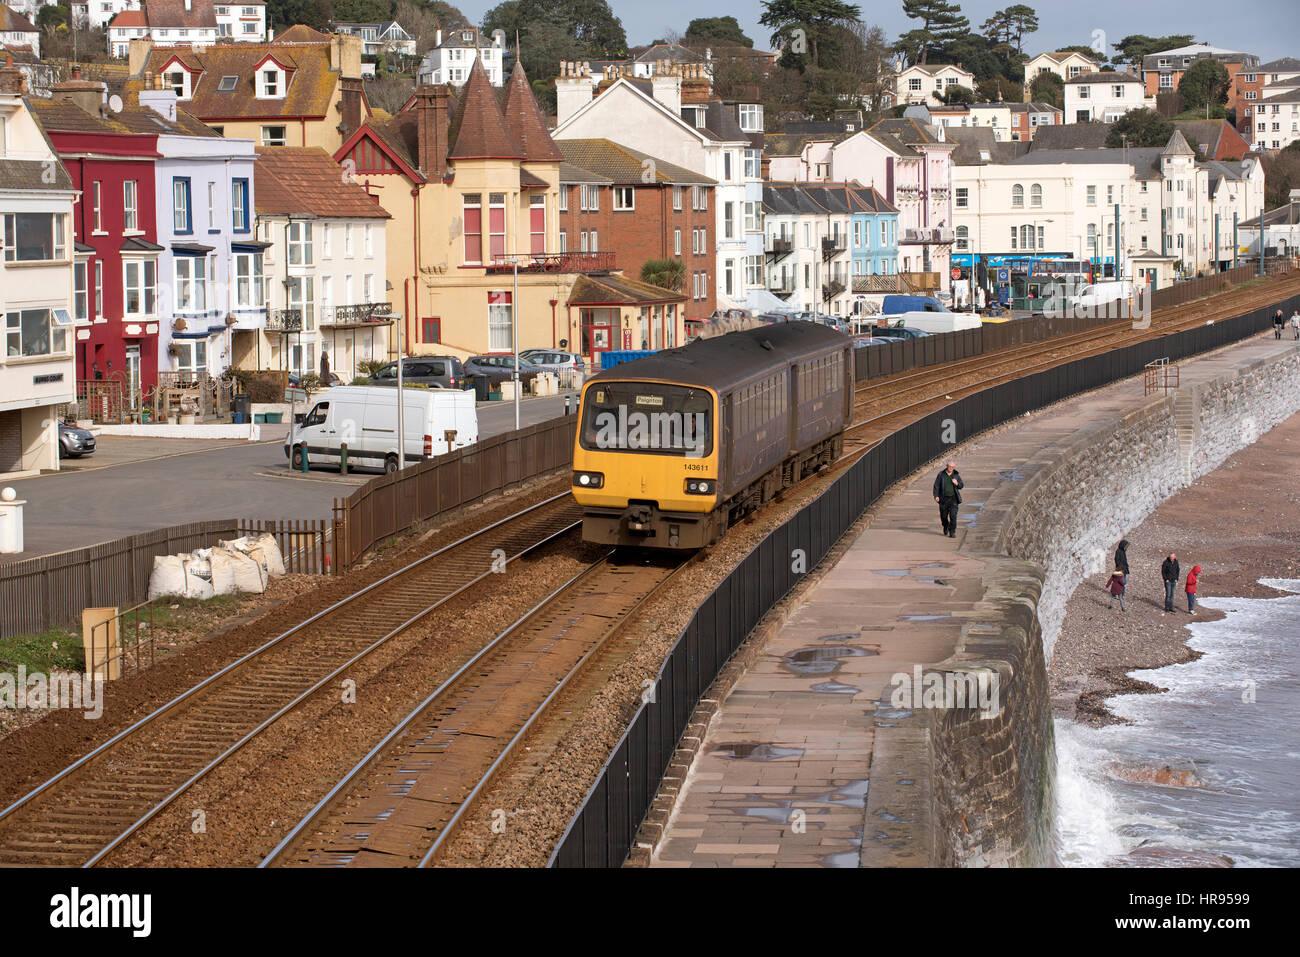 Passenger train passing through the seaside town of Dawlish in South Devon England UK - Stock Image